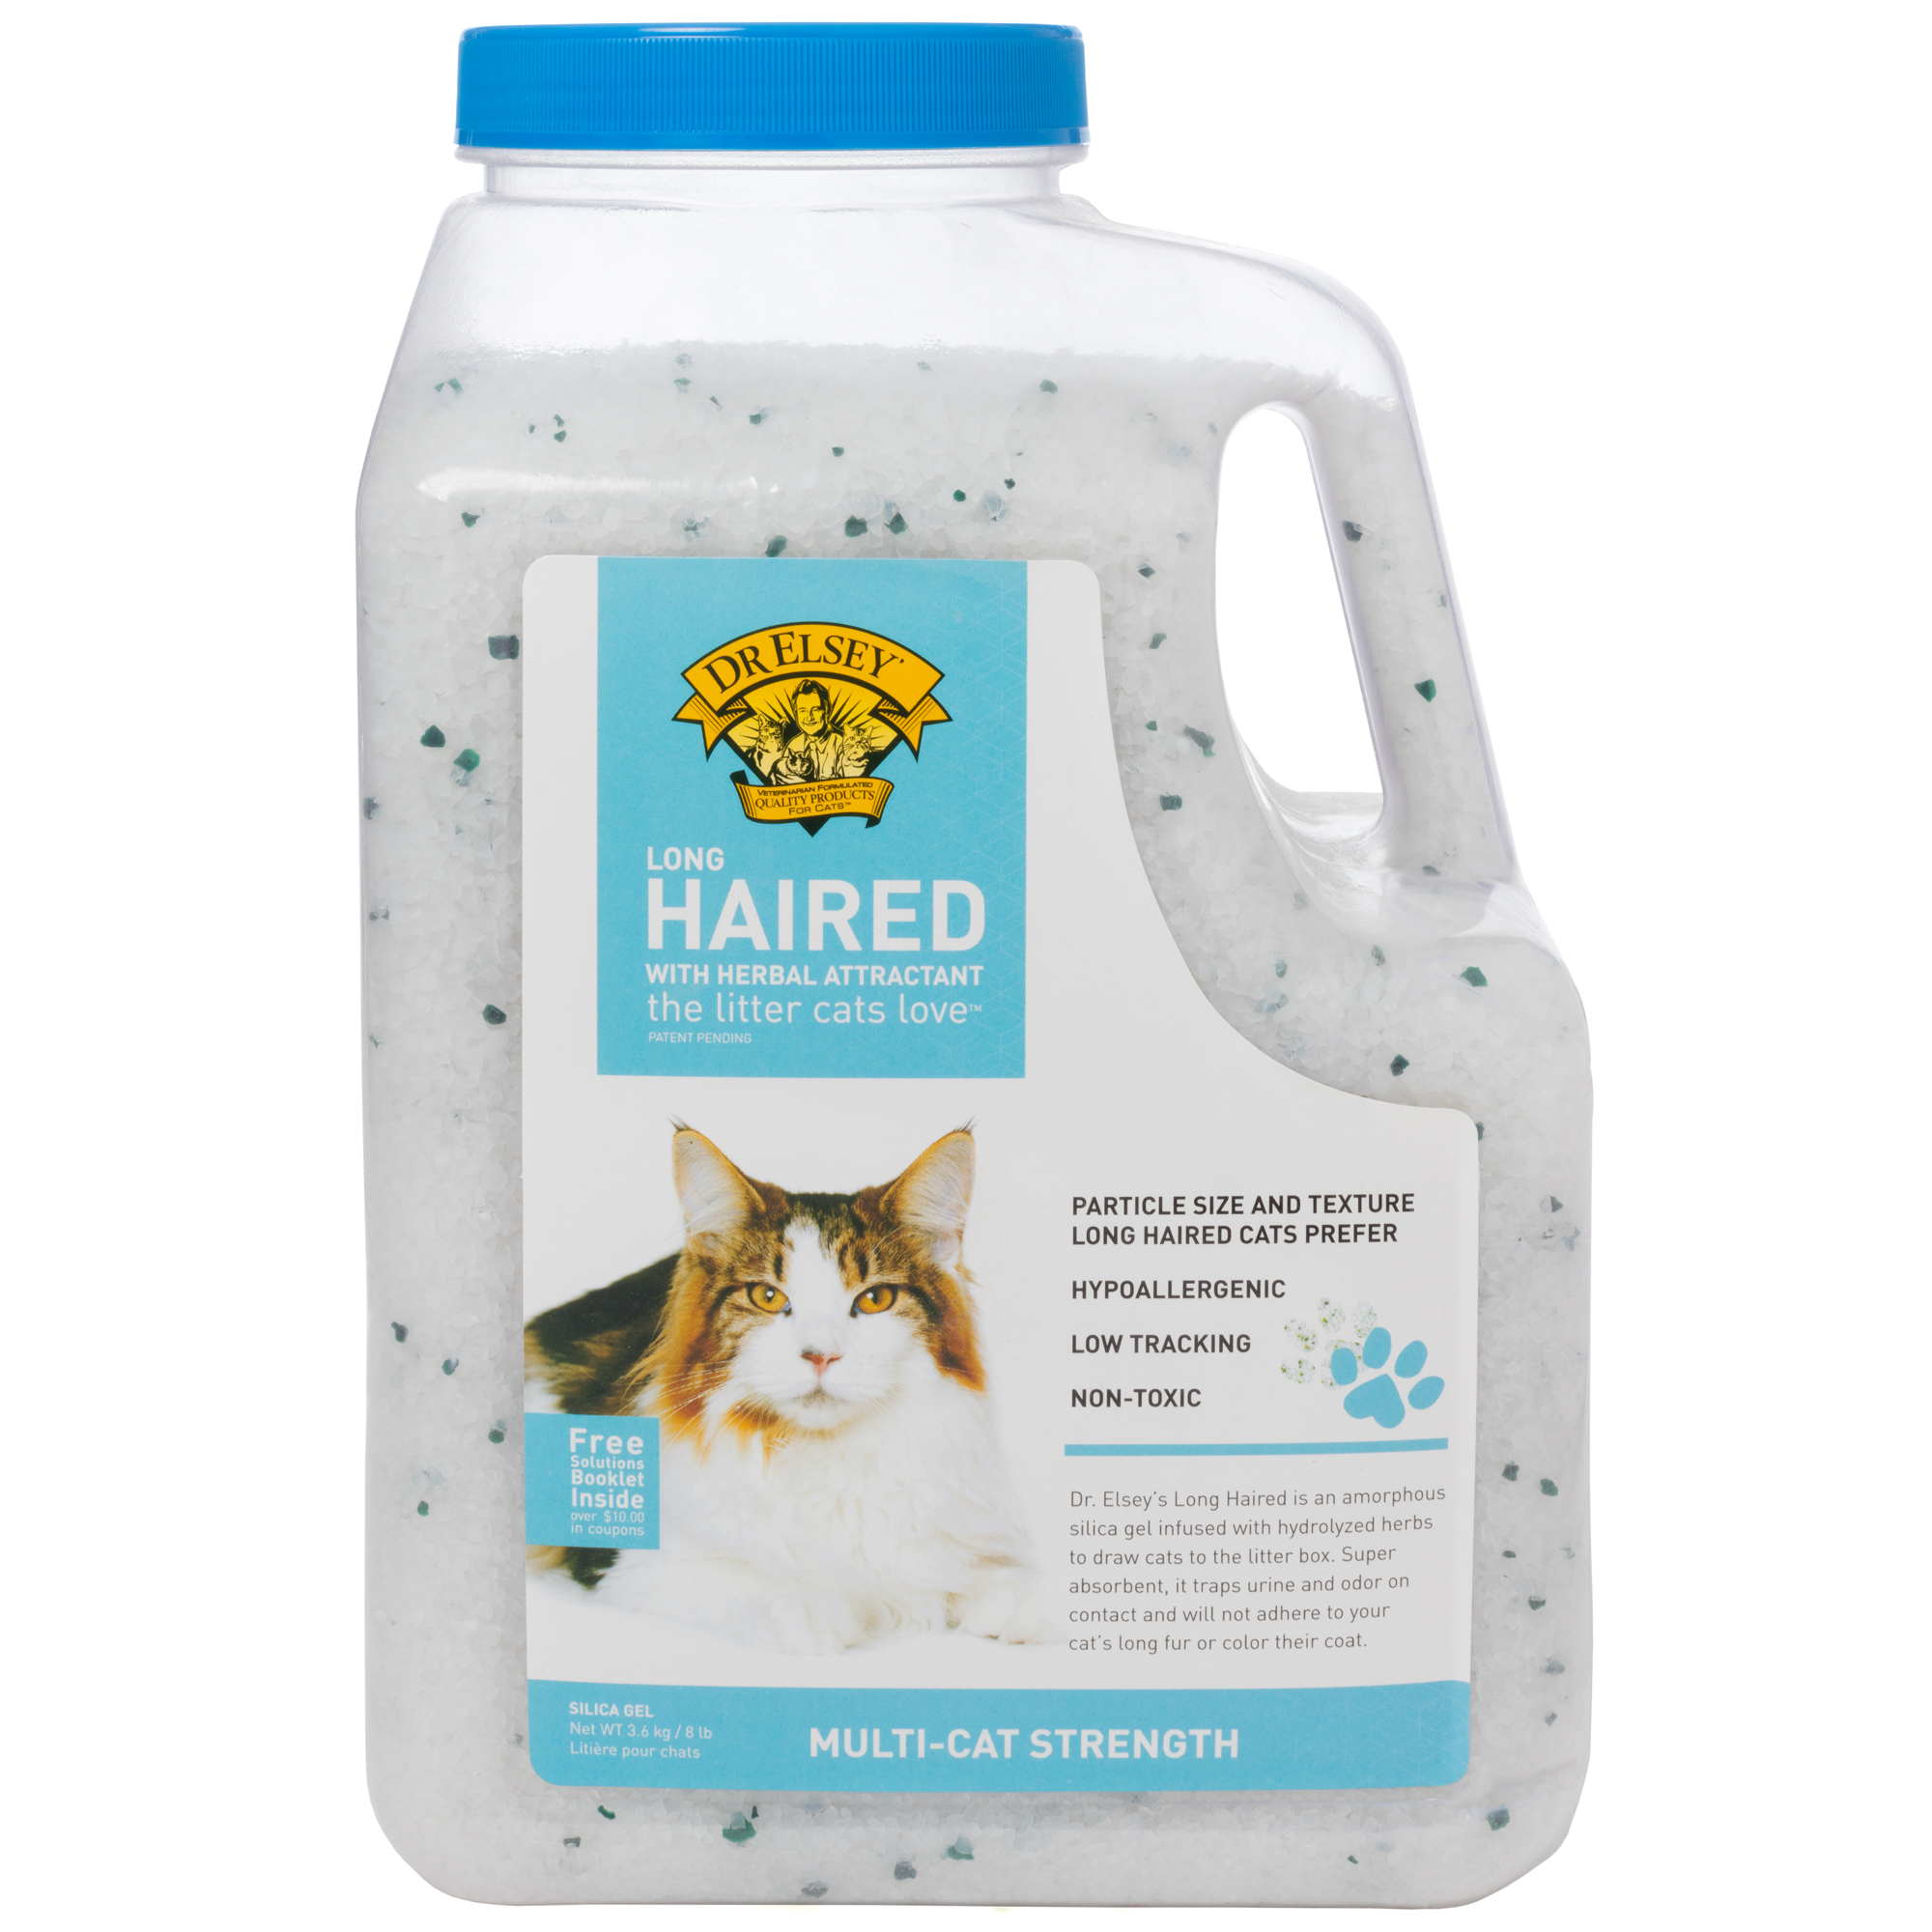 Precious Cat Long Haired Cat Litter, 8.2 Lb.